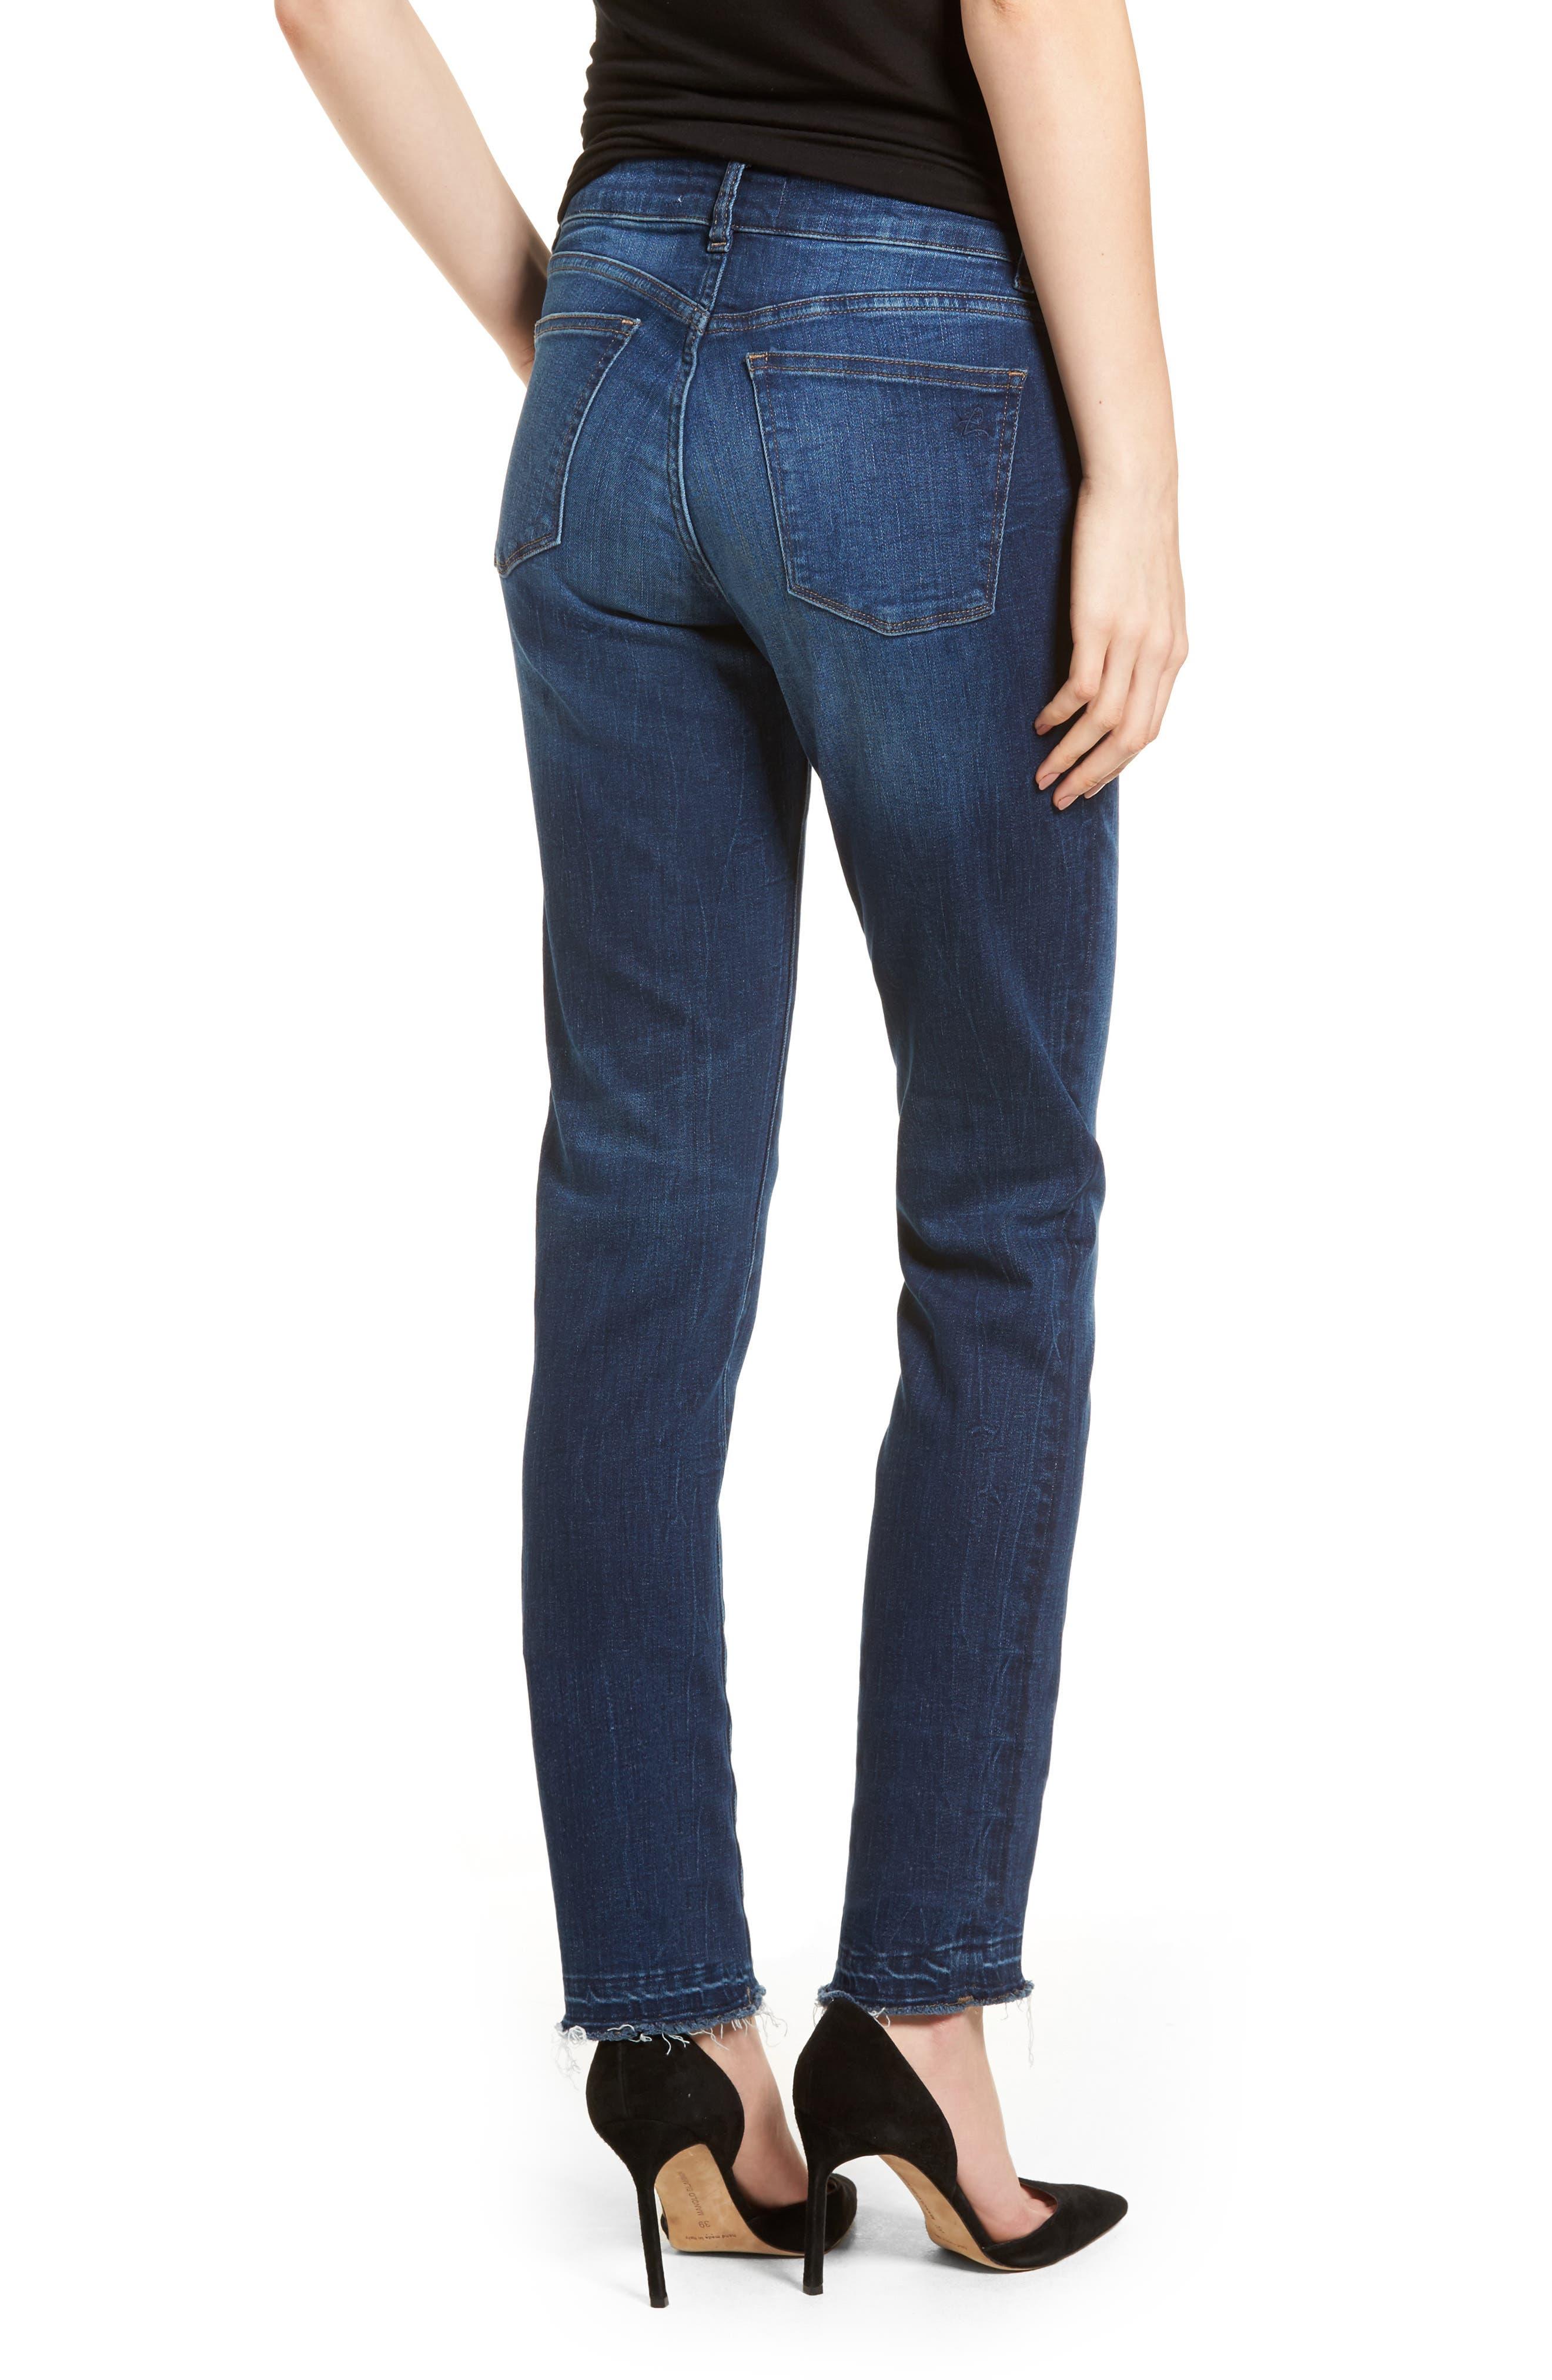 Coco Curvy Slim Straight Leg Jeans,                             Alternate thumbnail 2, color,